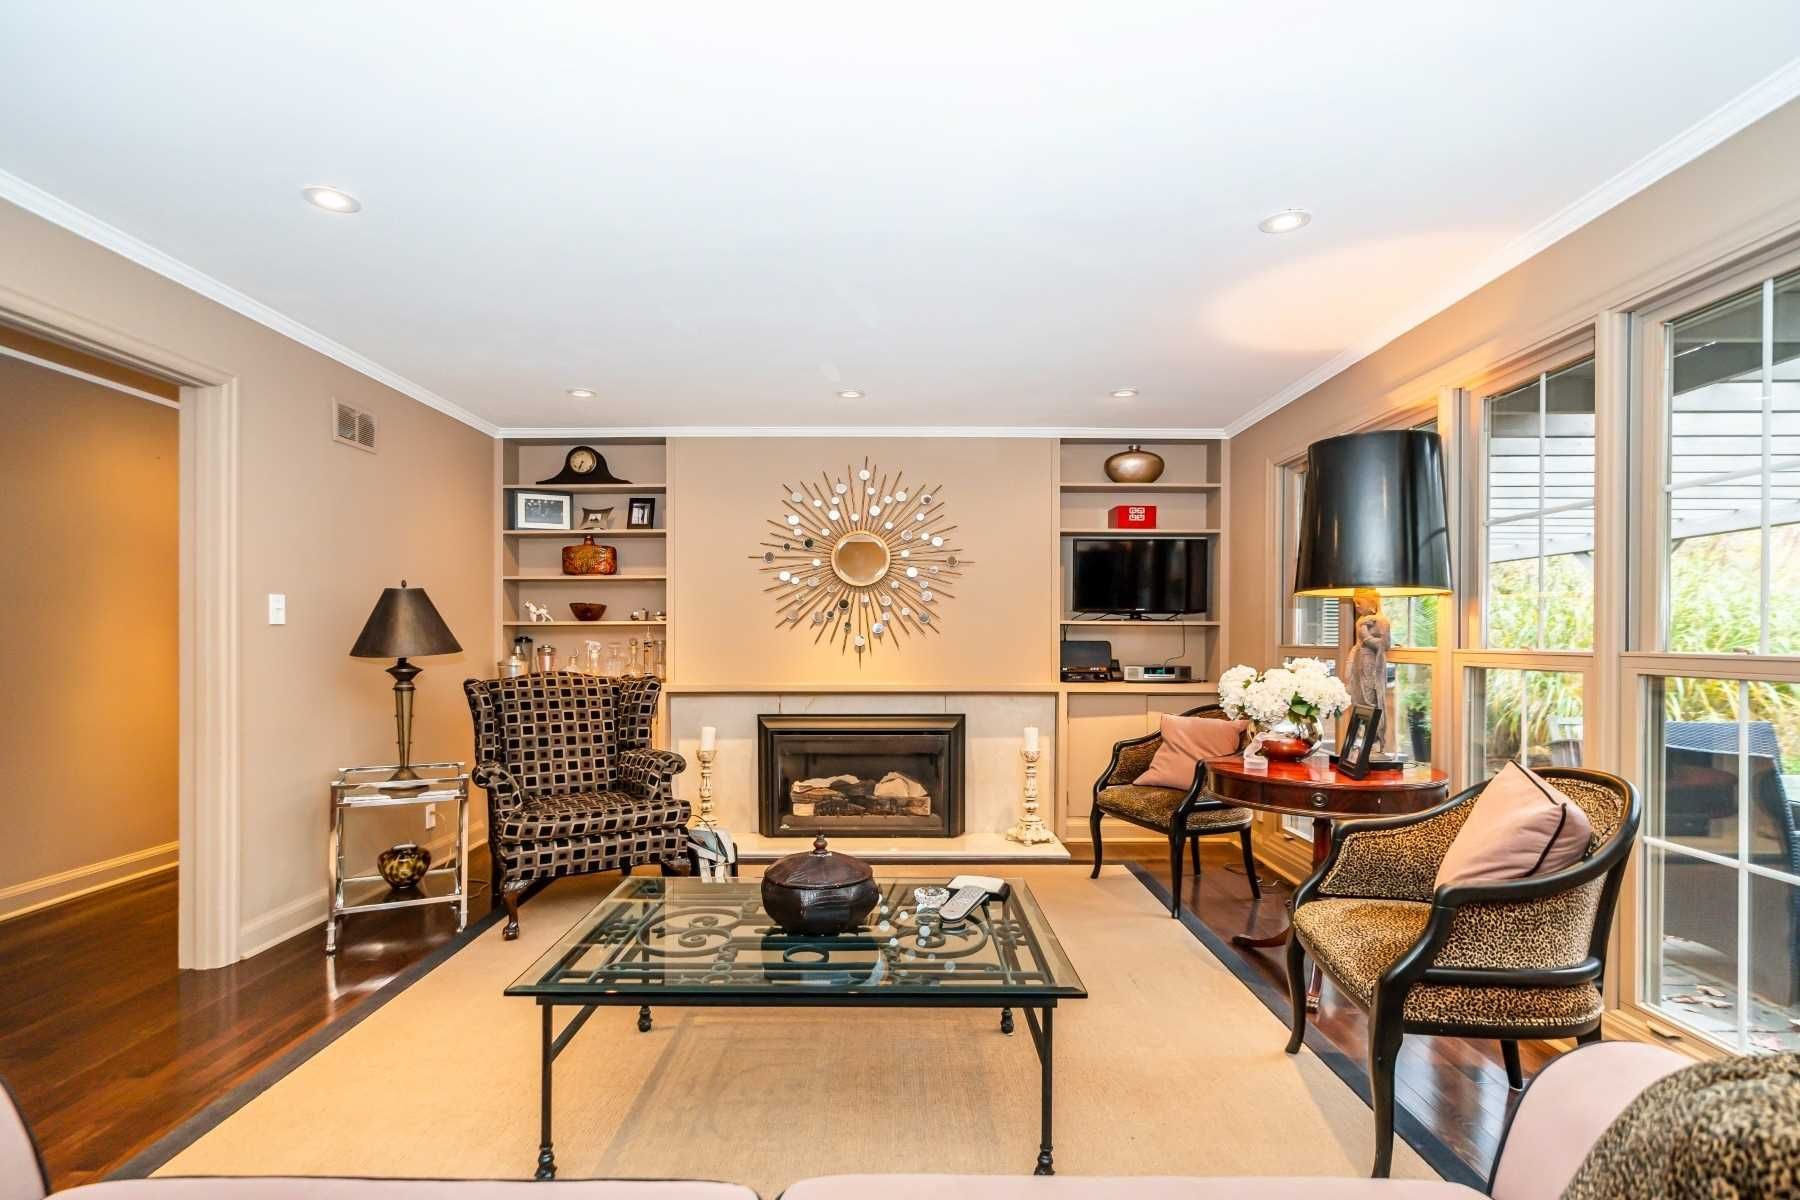 Photo 13: Photos: 782 Bessborough Drive in Oshawa: Centennial House (Bungalow) for sale : MLS®# E4968487